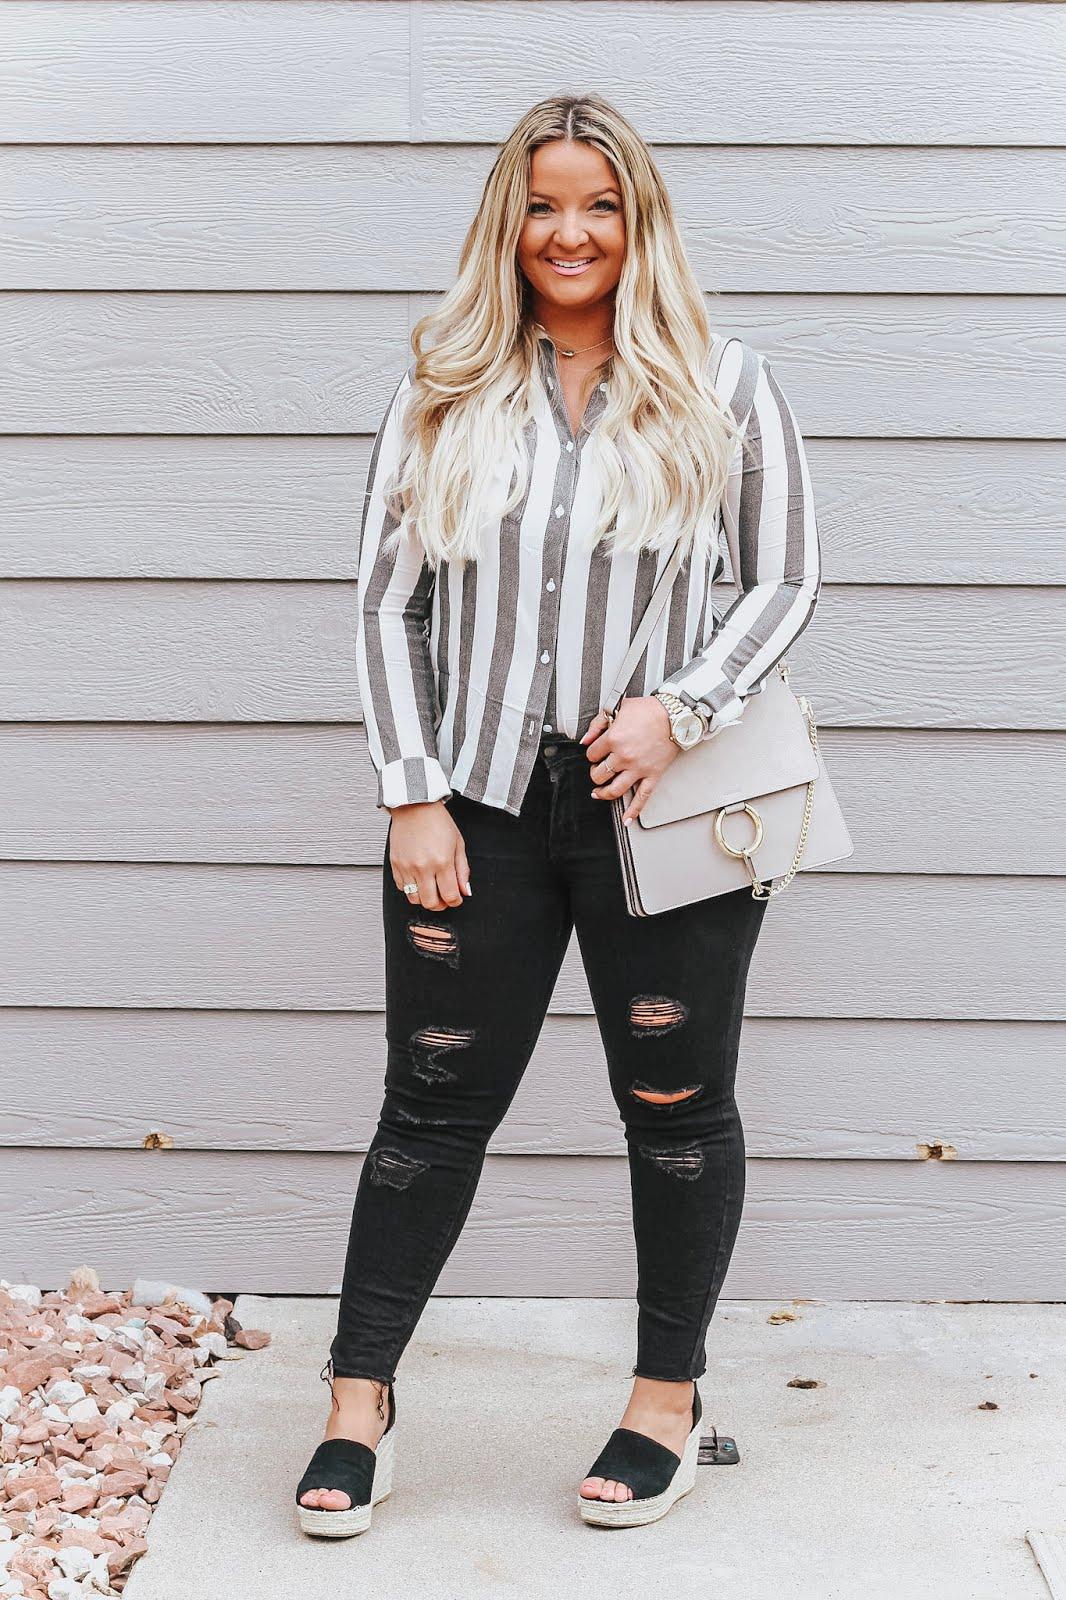 Wearing a Striped Outfit like Waldo styled by popular Denver fashion blogger, Delayna Denaye